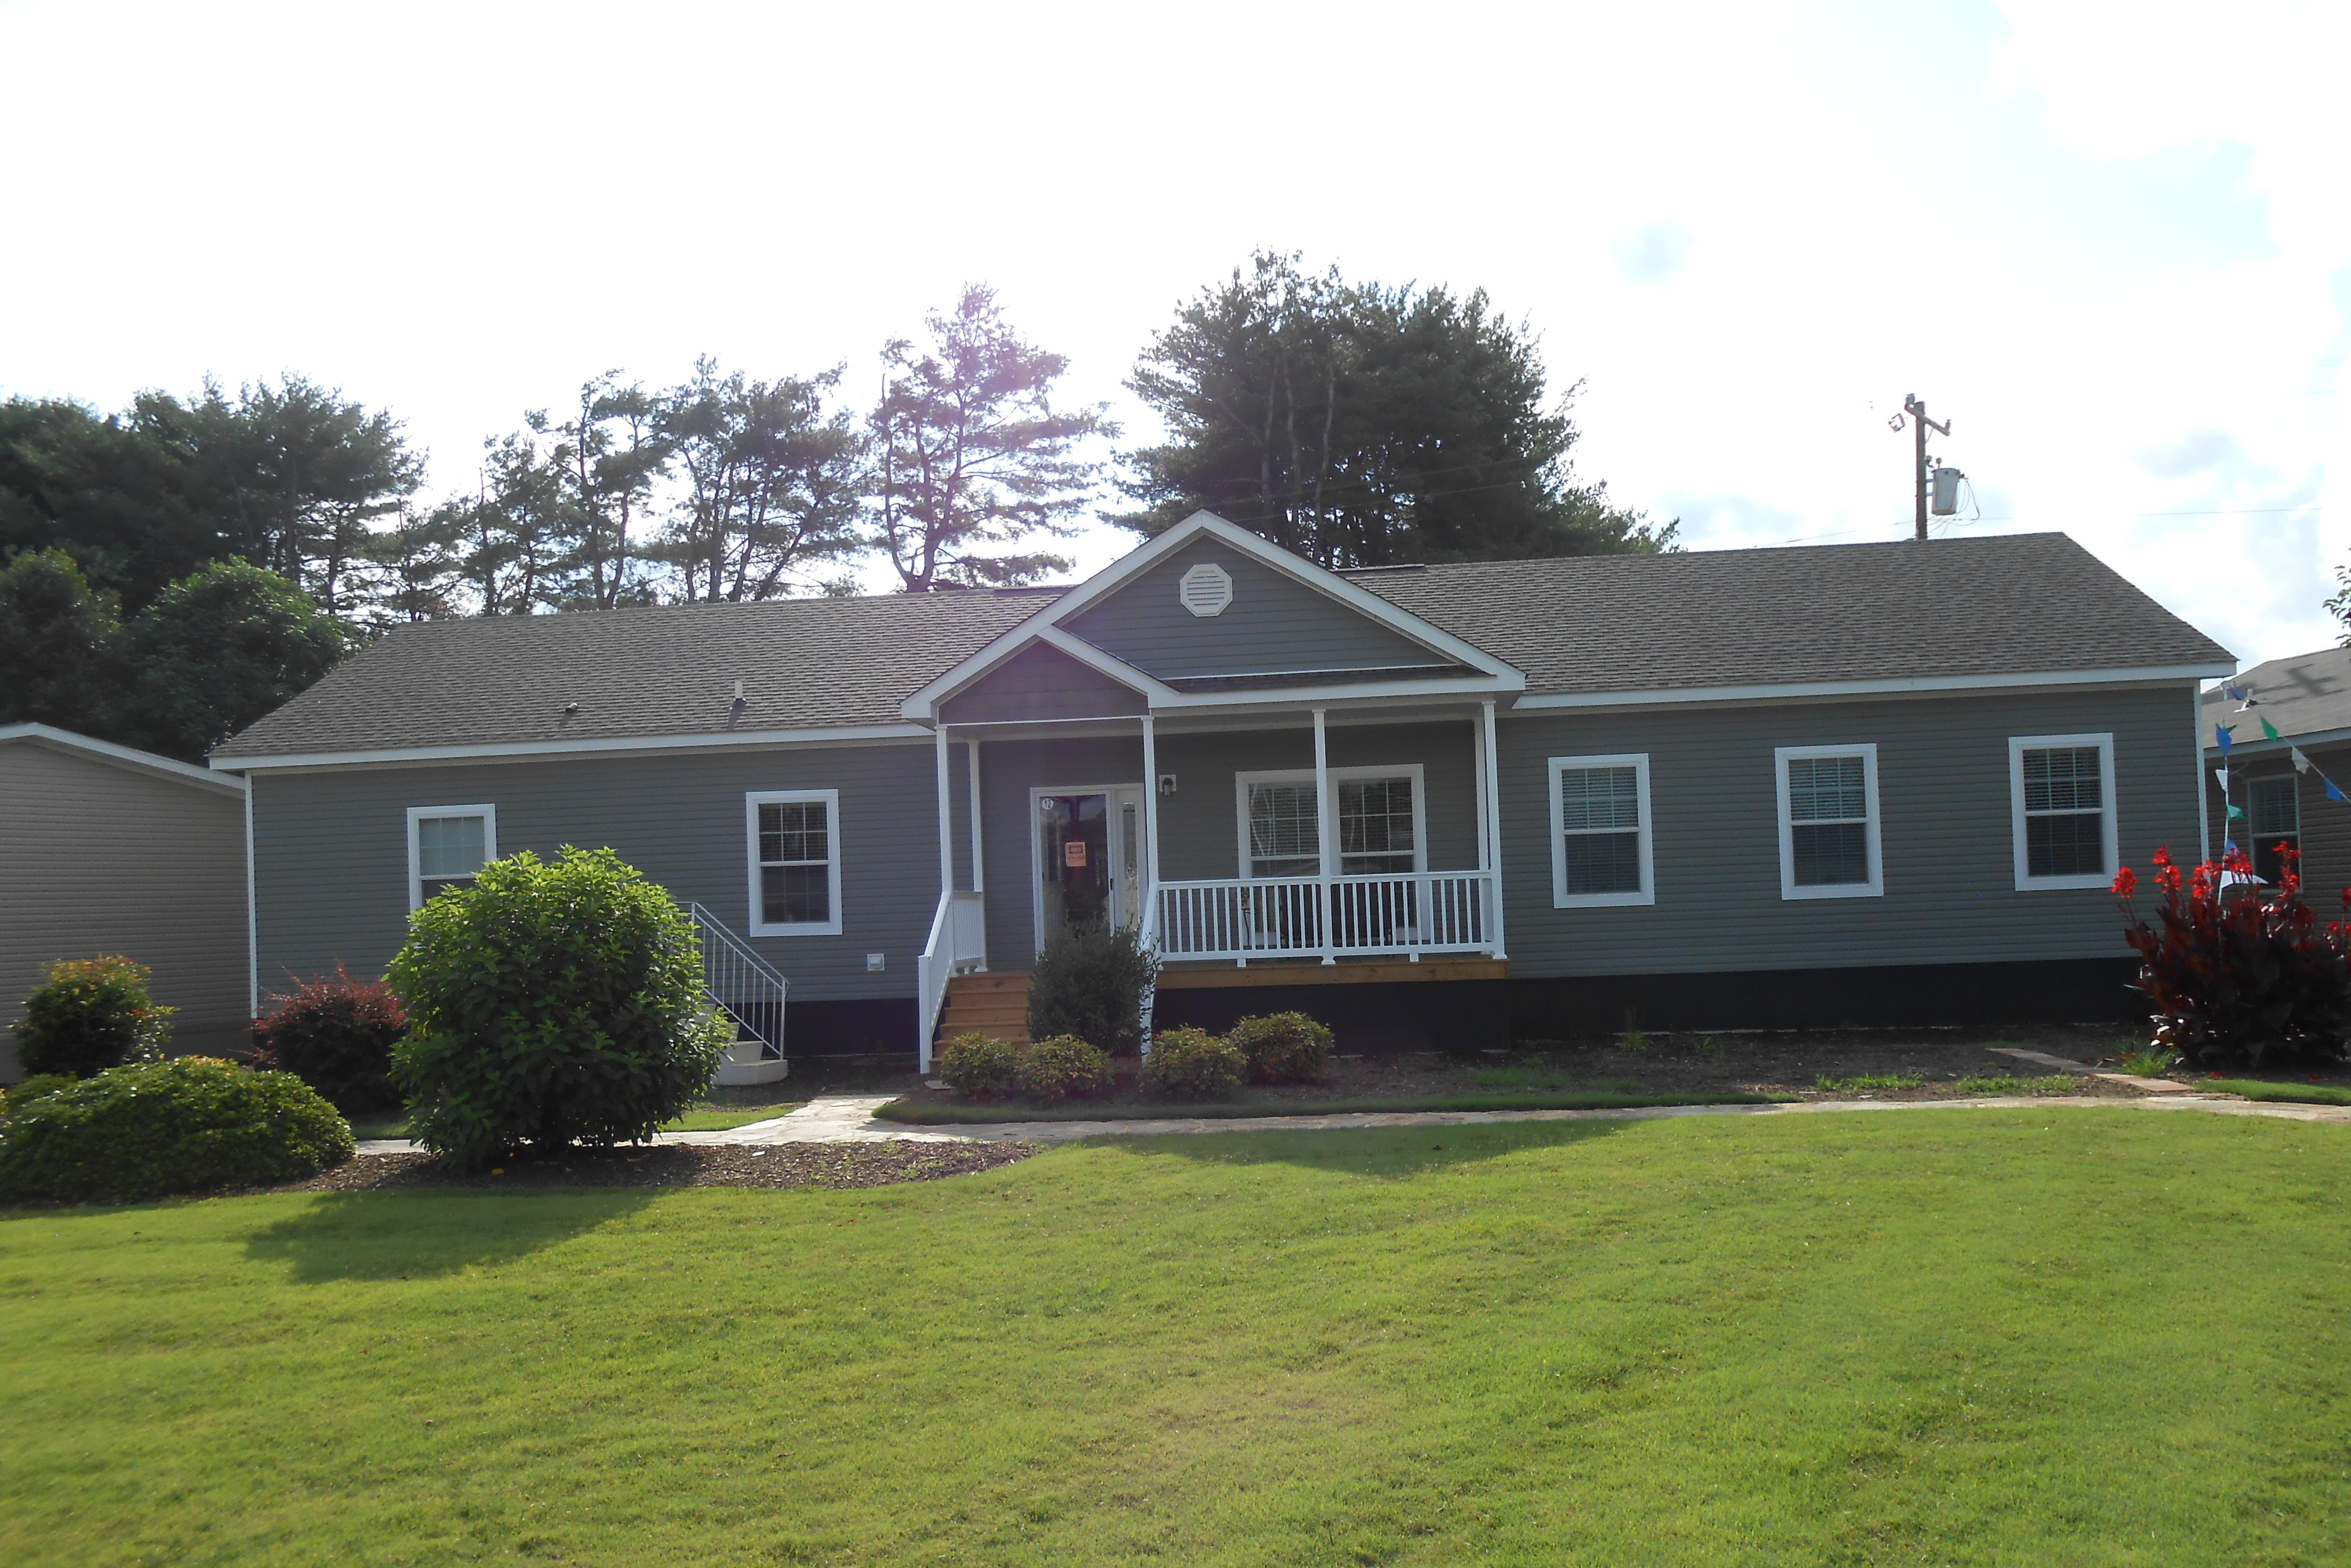 Oakwood Homes 1224 S Live Oak Dr Moncks Corner Sc 29461